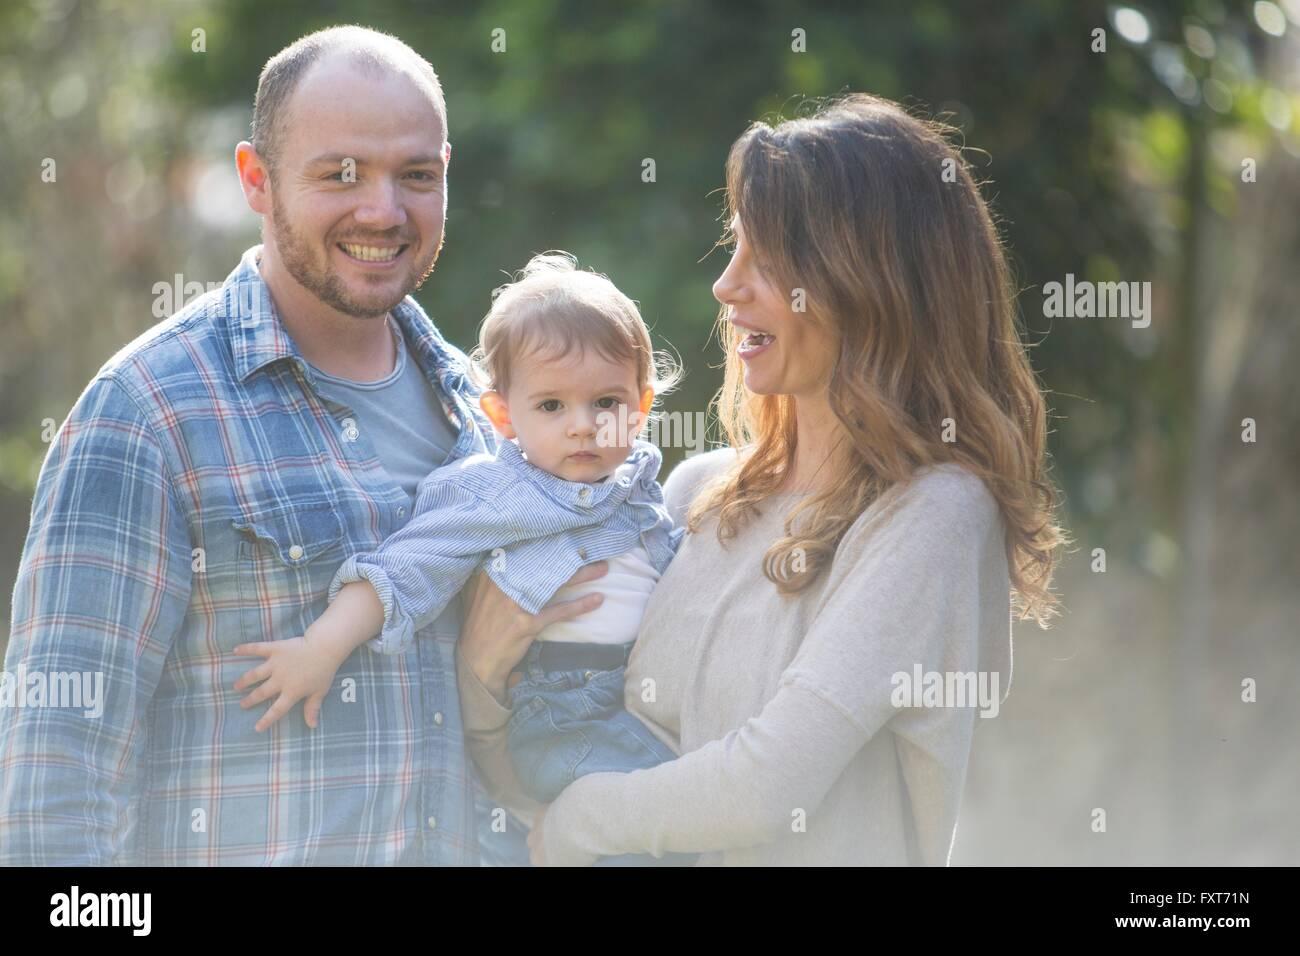 Smiling parents holding baby boy - Stock Image